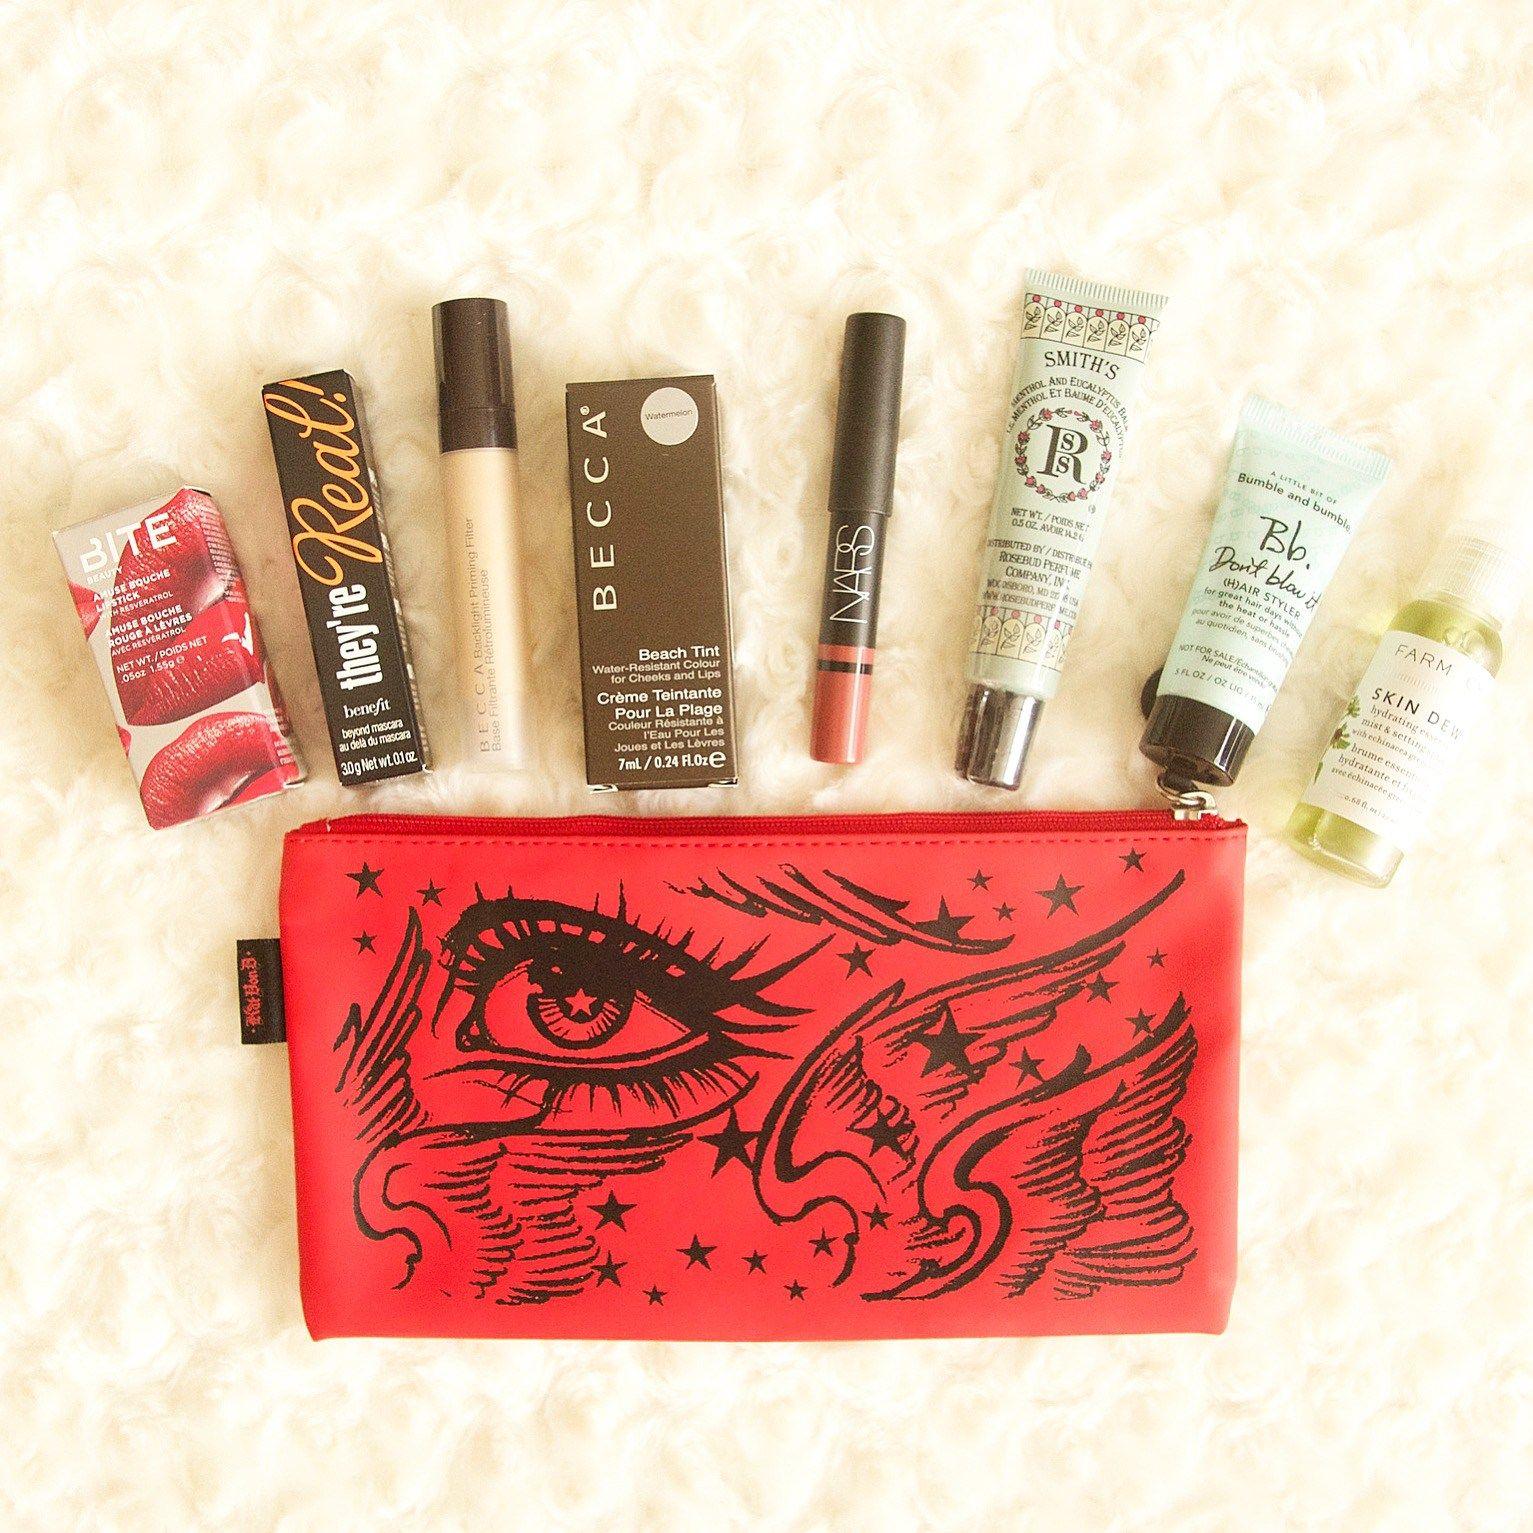 Sephora Beauty Bag Giveaway